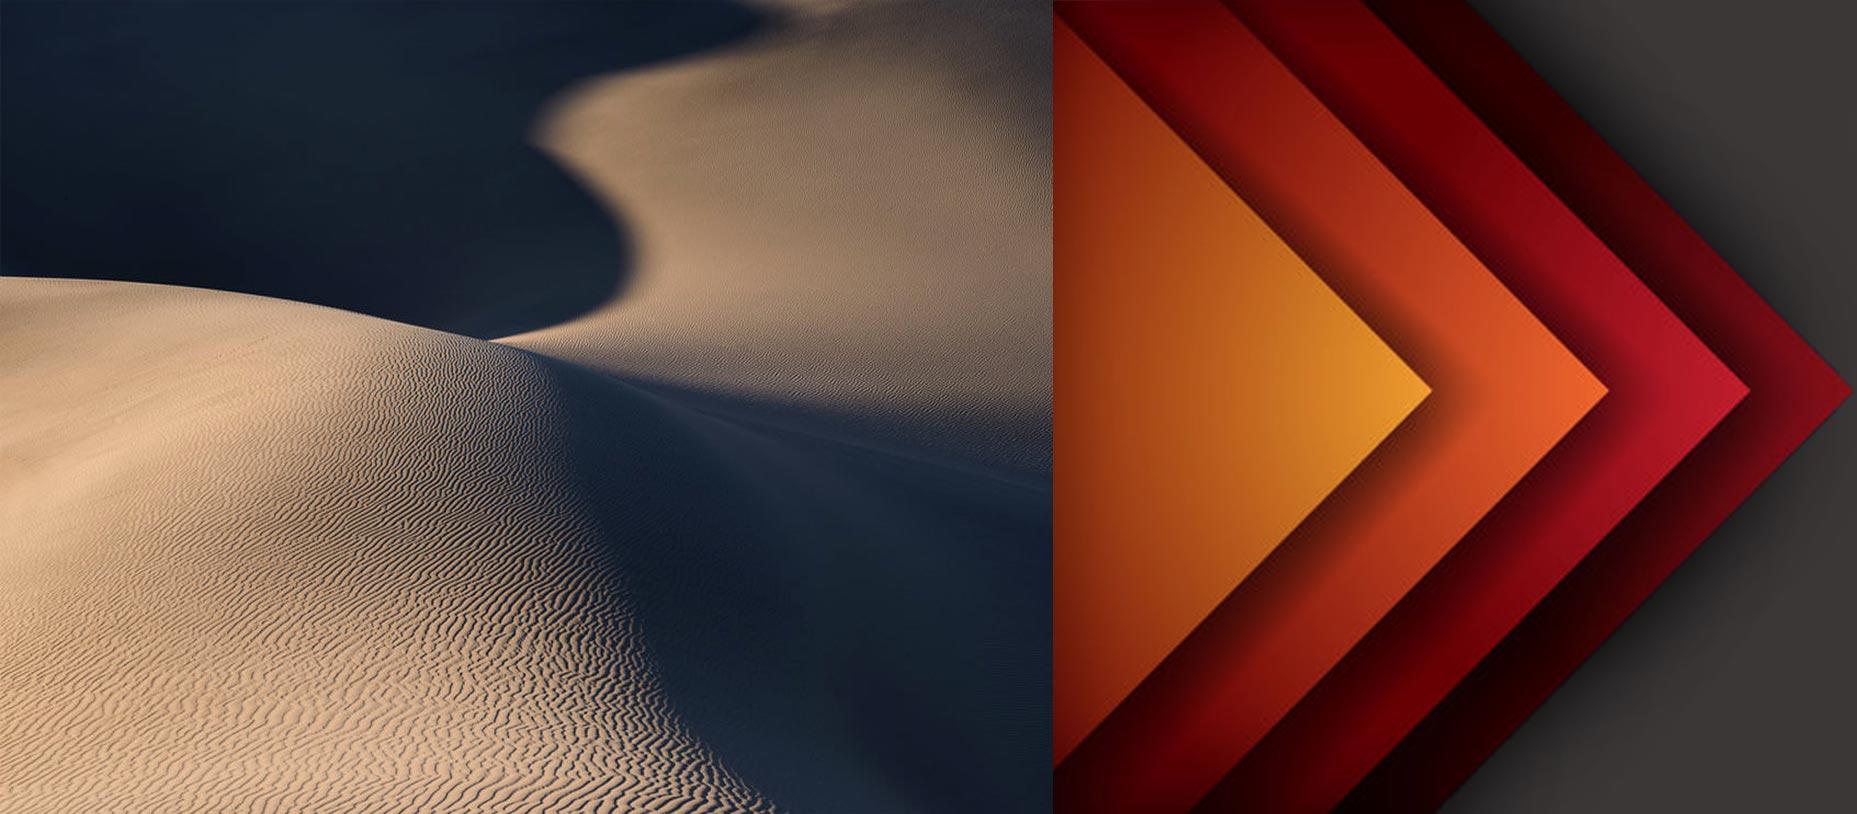 Abstract  Photography8jpg 1 - 35 ایده و راهنما برای عکاسی انتراعی